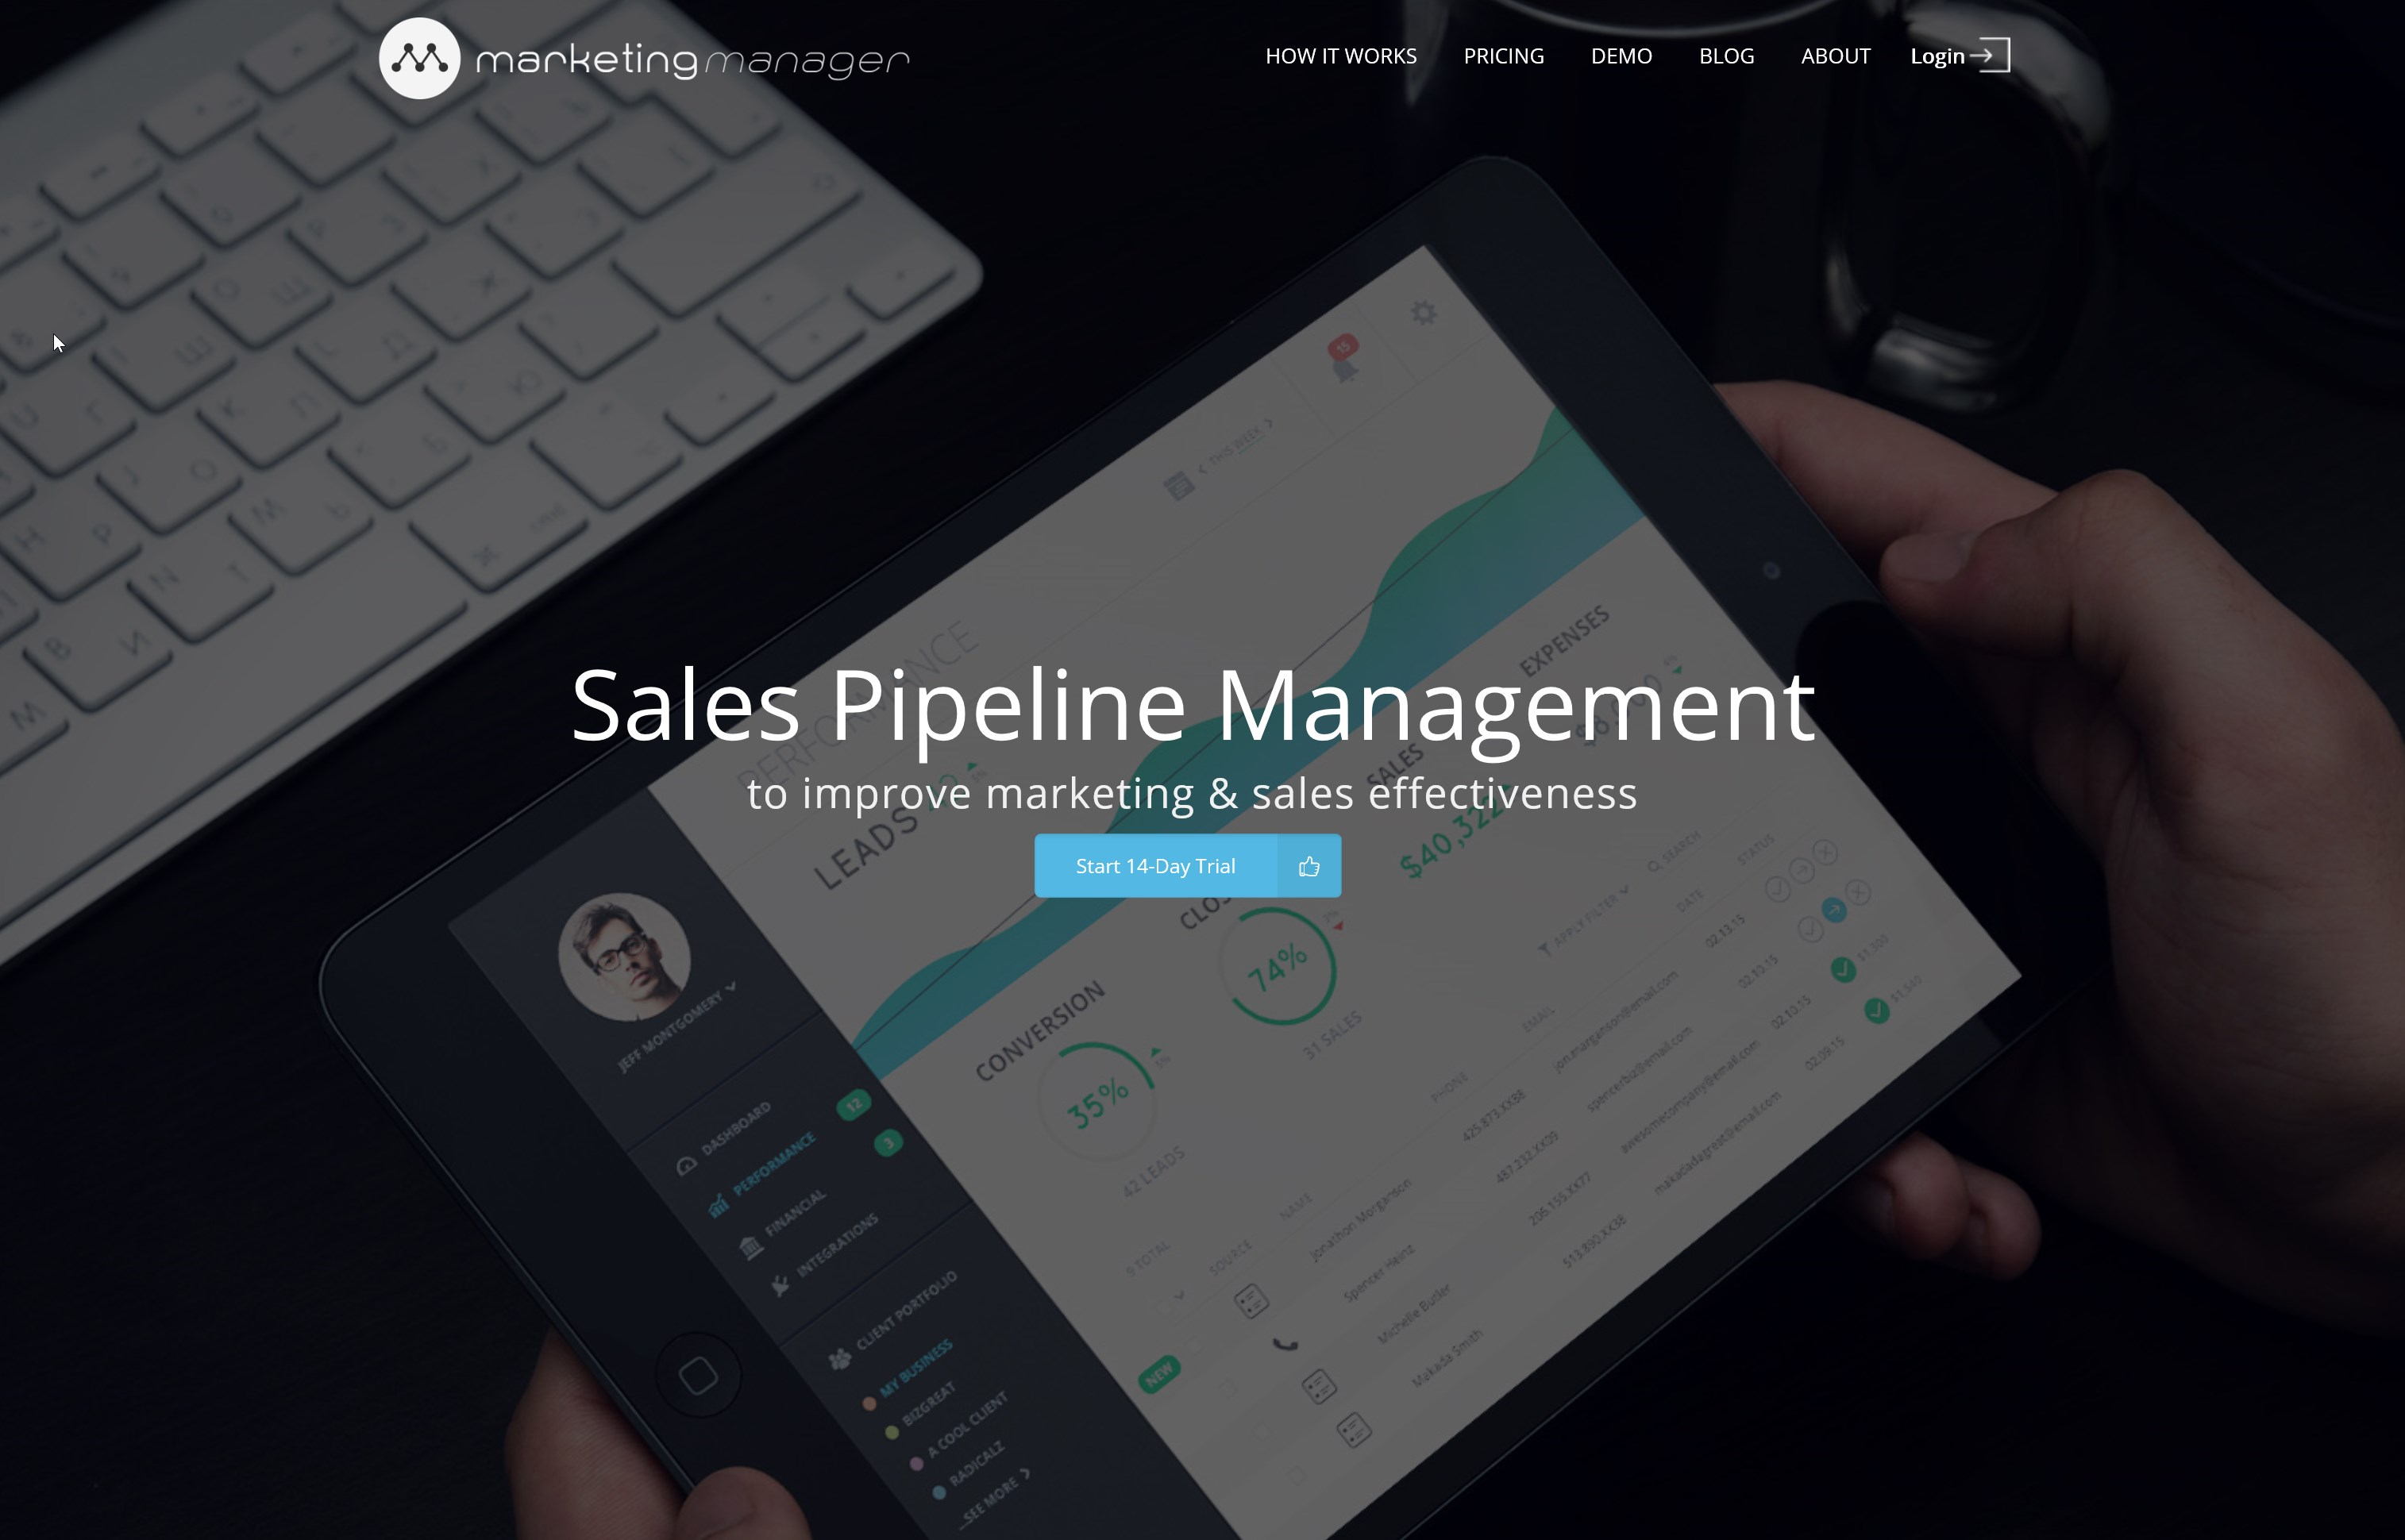 marketing manager homepage design